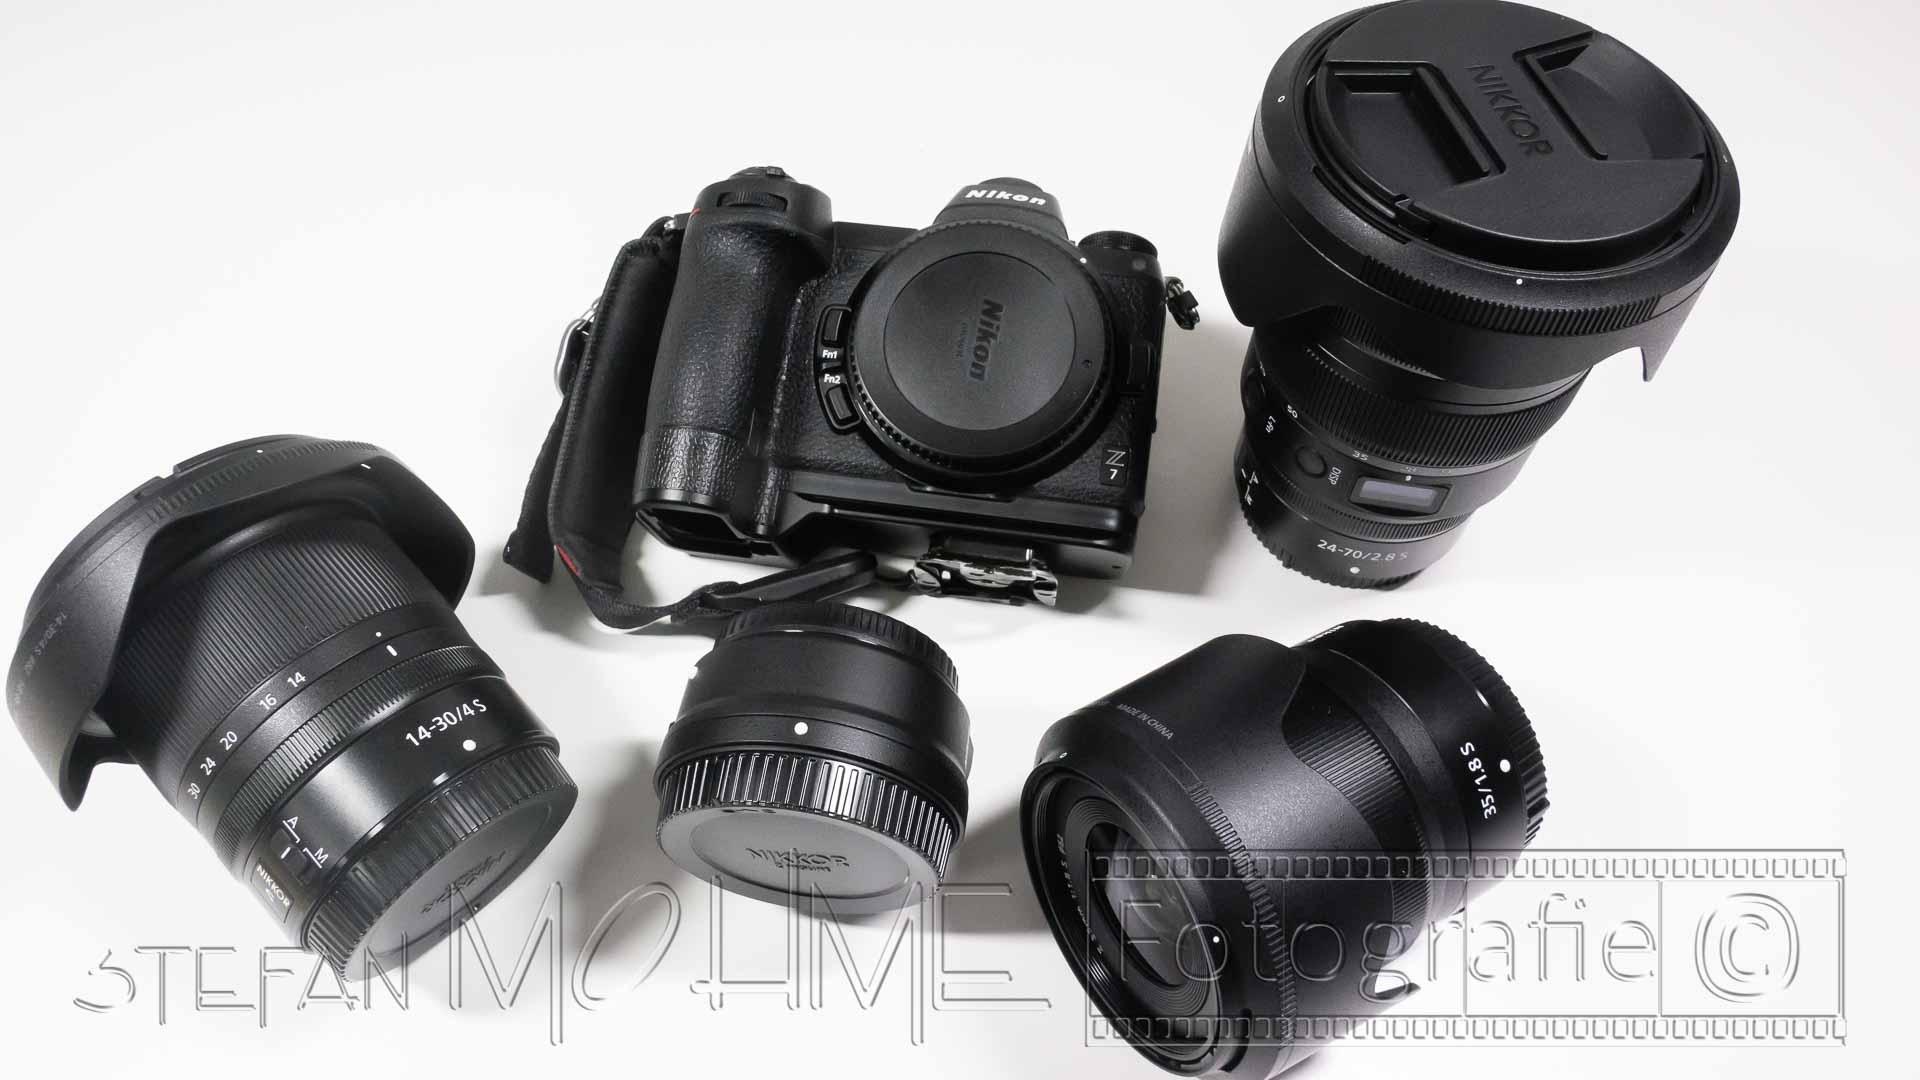 Nikons spiegelloses Kamerasystem, das z System Teil 2, die Objektive